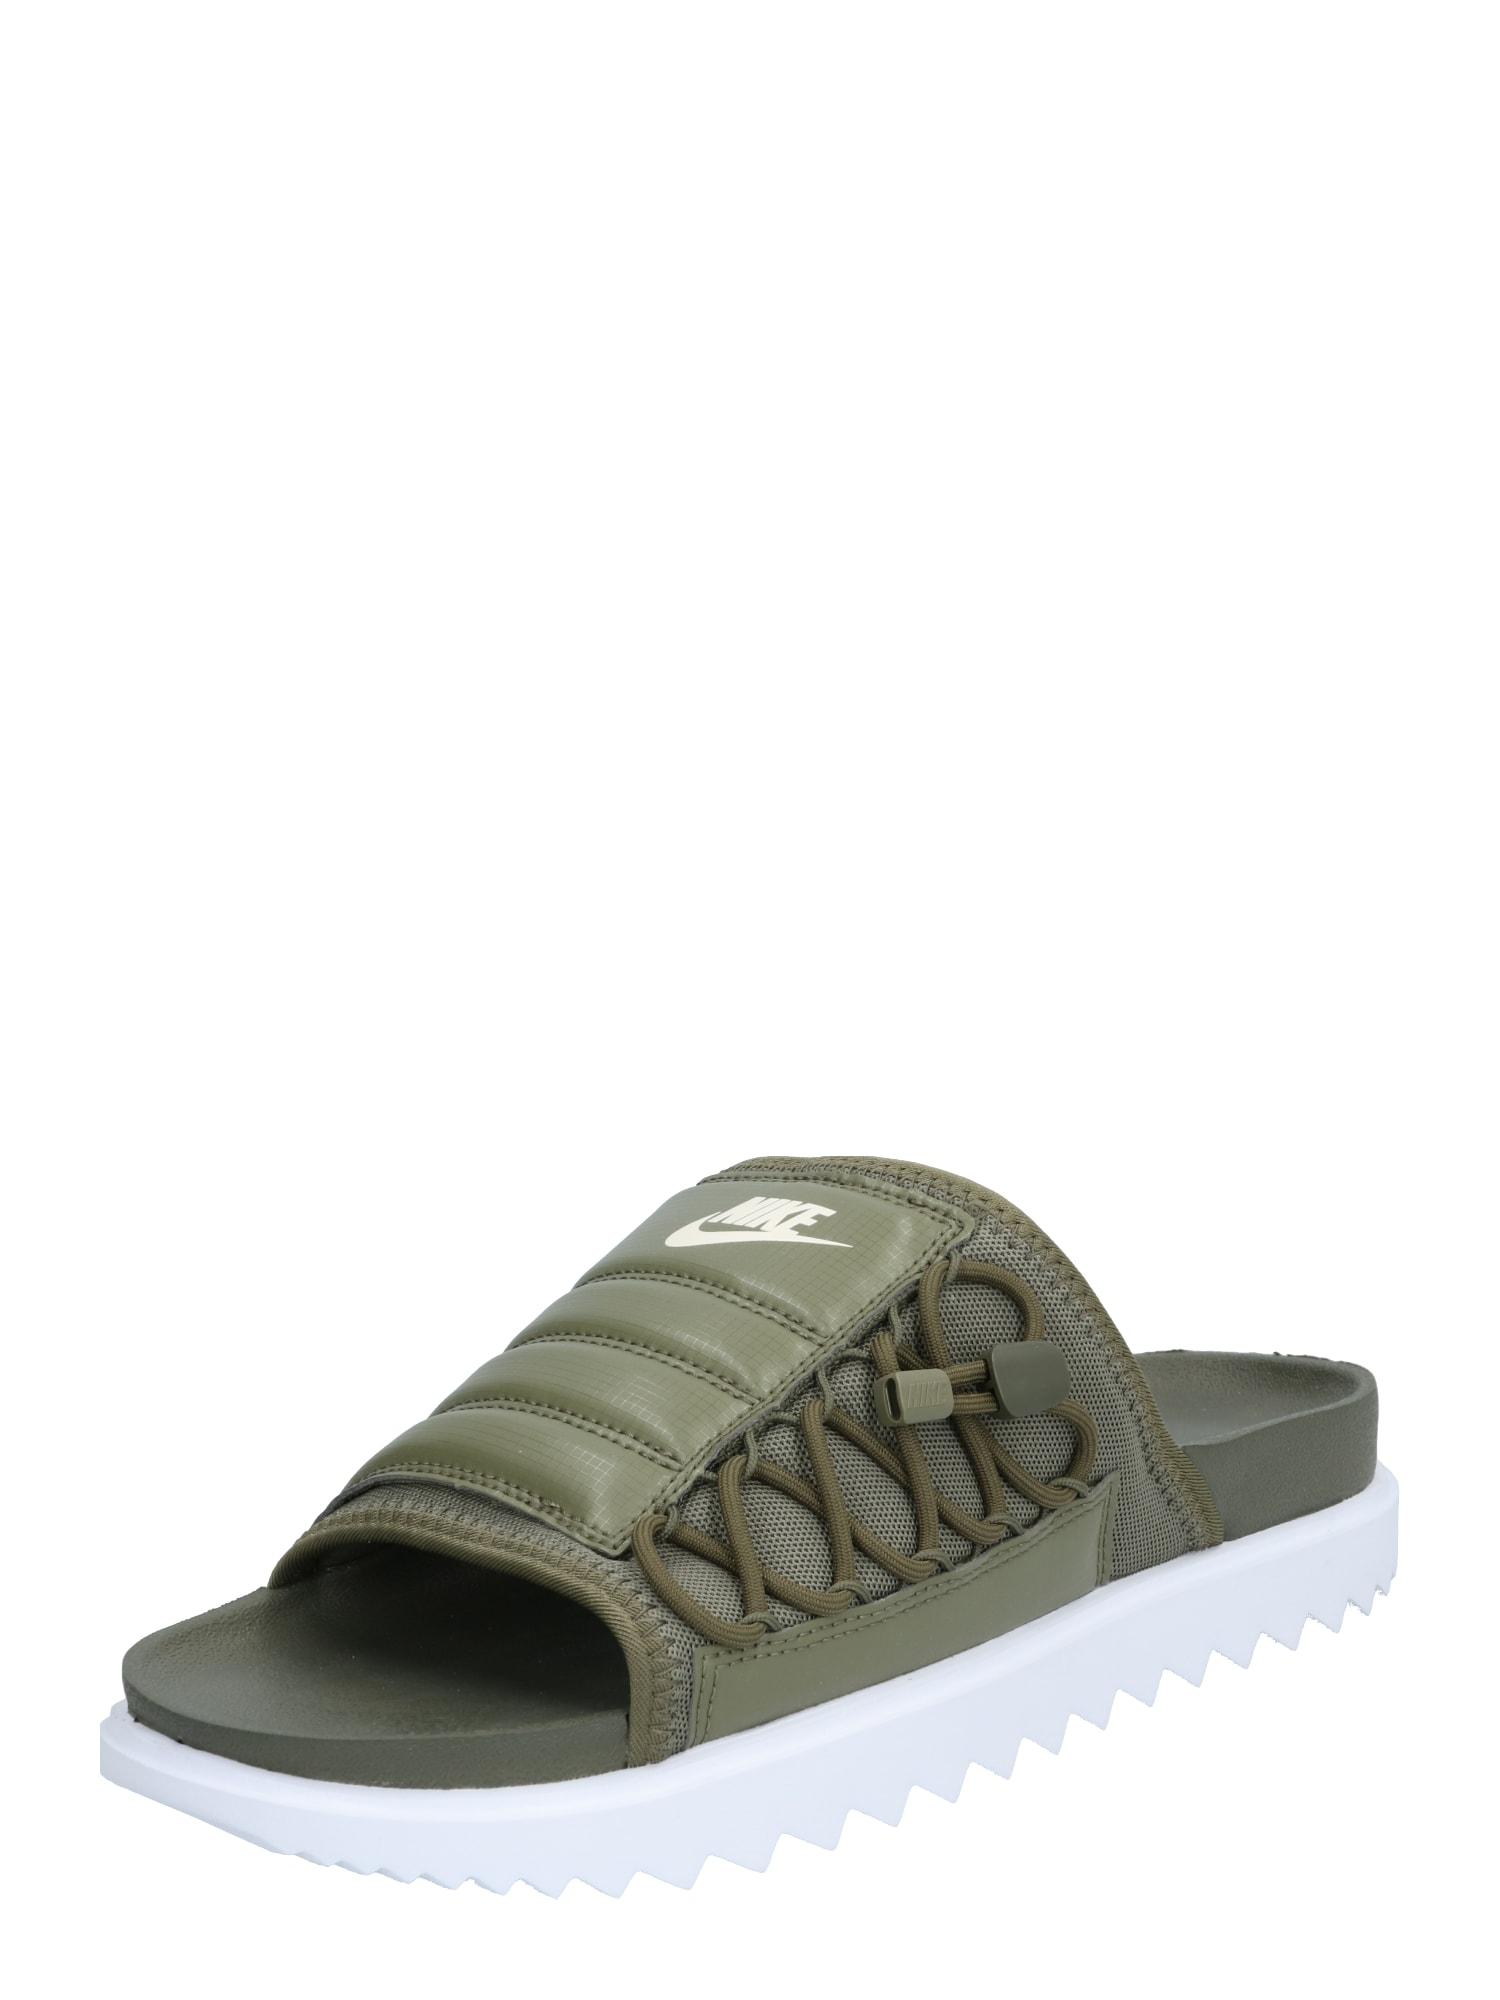 Nike Sportswear Šľapky 'City Slide'  biela / kaki